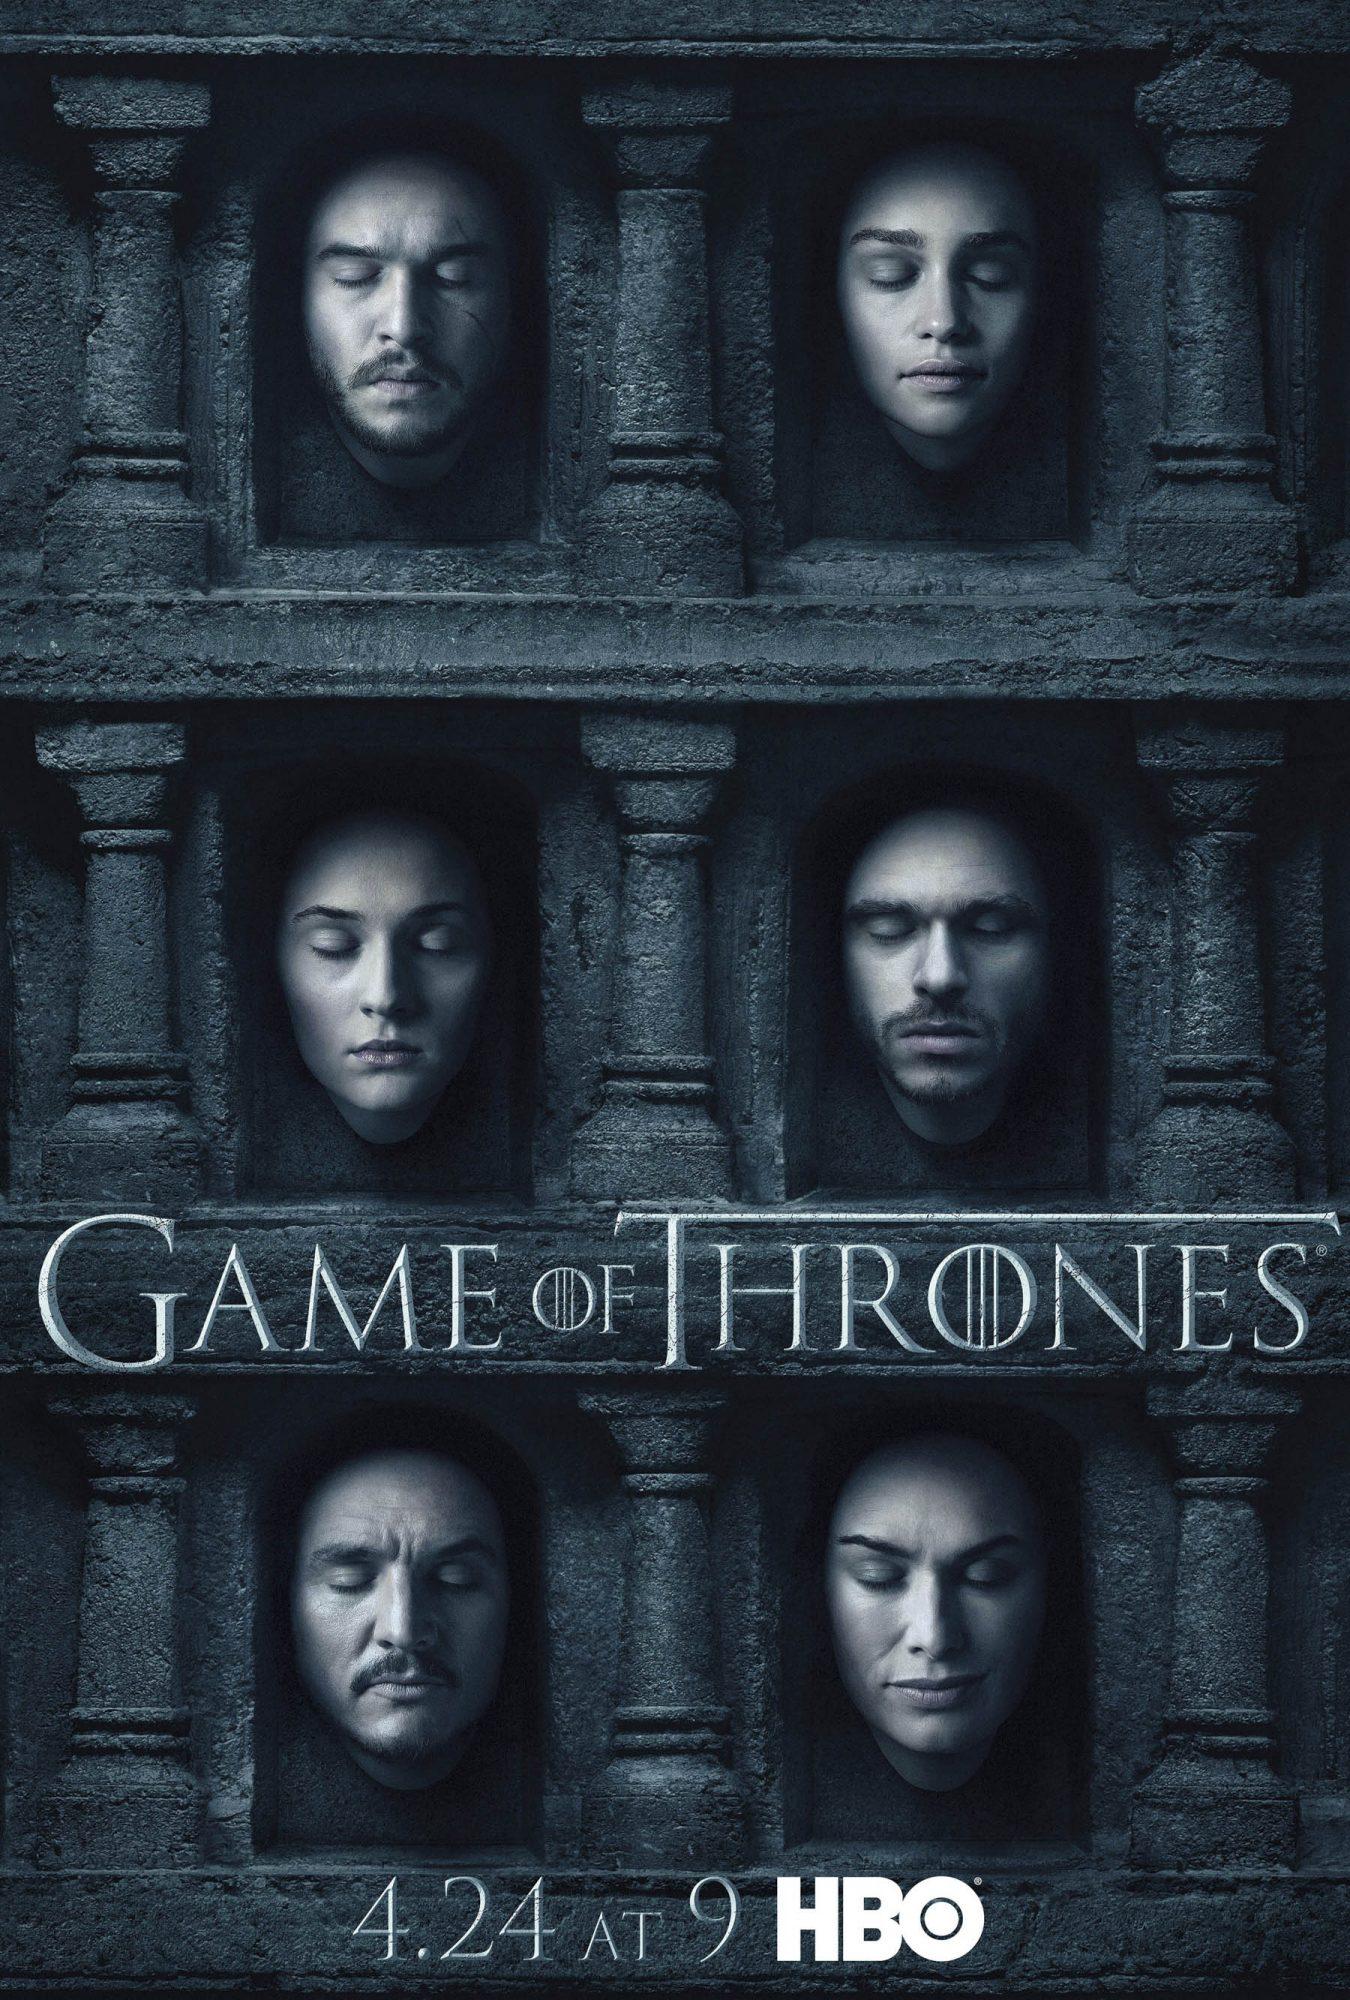 Game of Thrones poster/key artSeason 6CR: HBO